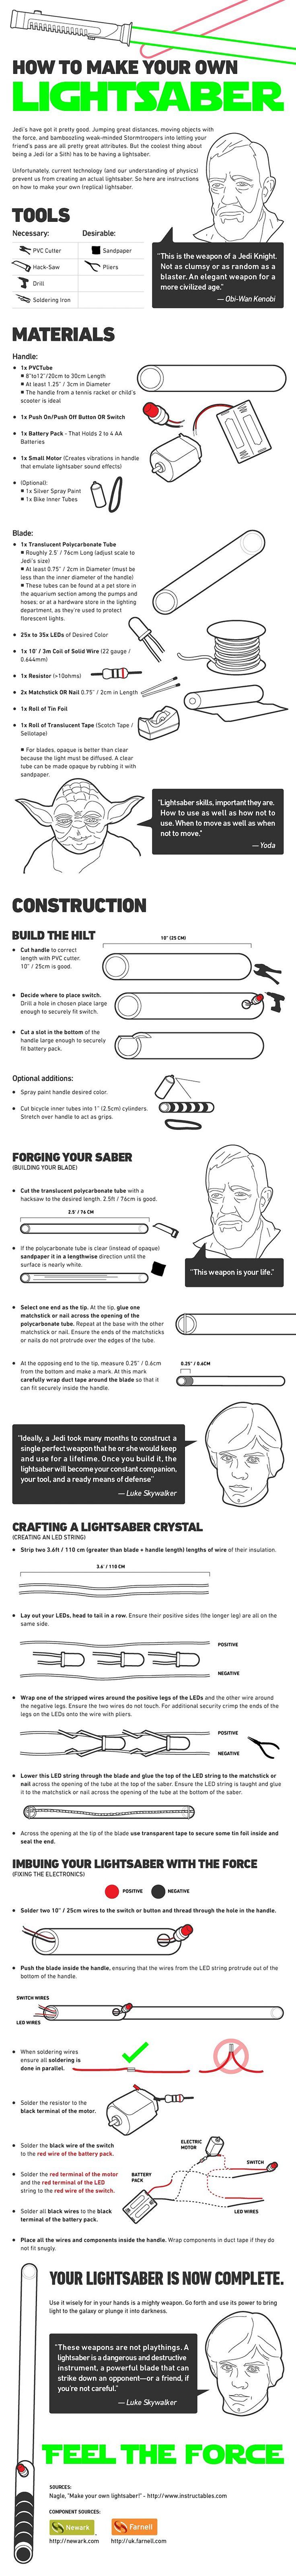 Make Your Own Lightsaber: DIY Instructions